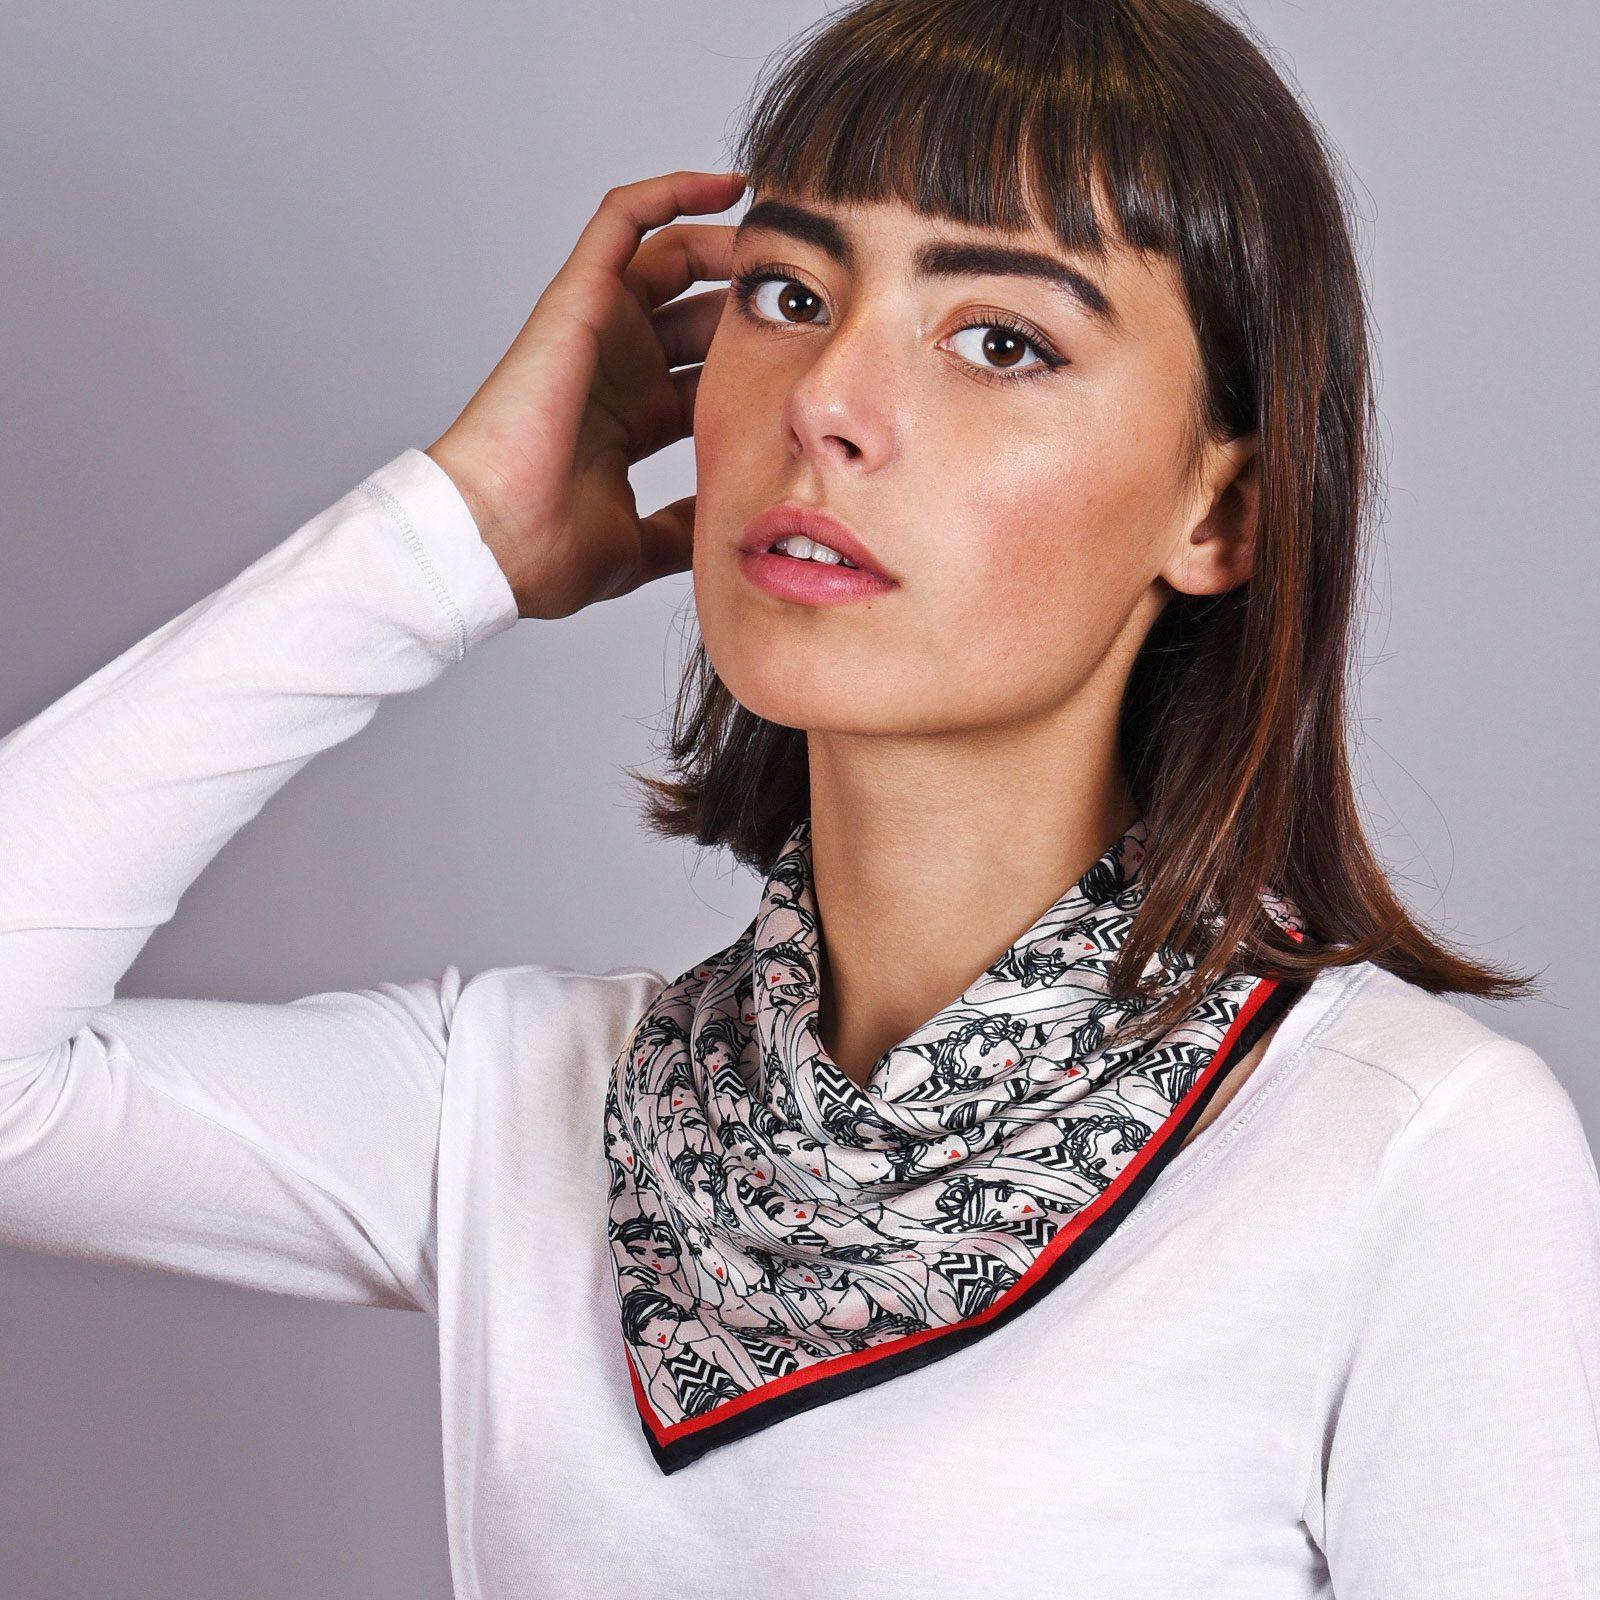 http://lookbook.allee-du-foulard.fr/wp-content/uploads/2018/12/AT-04607-VF16-1-foulard-carre-en-soie-noir-femmes-65x65-made-in-italie-1600x1600.jpg